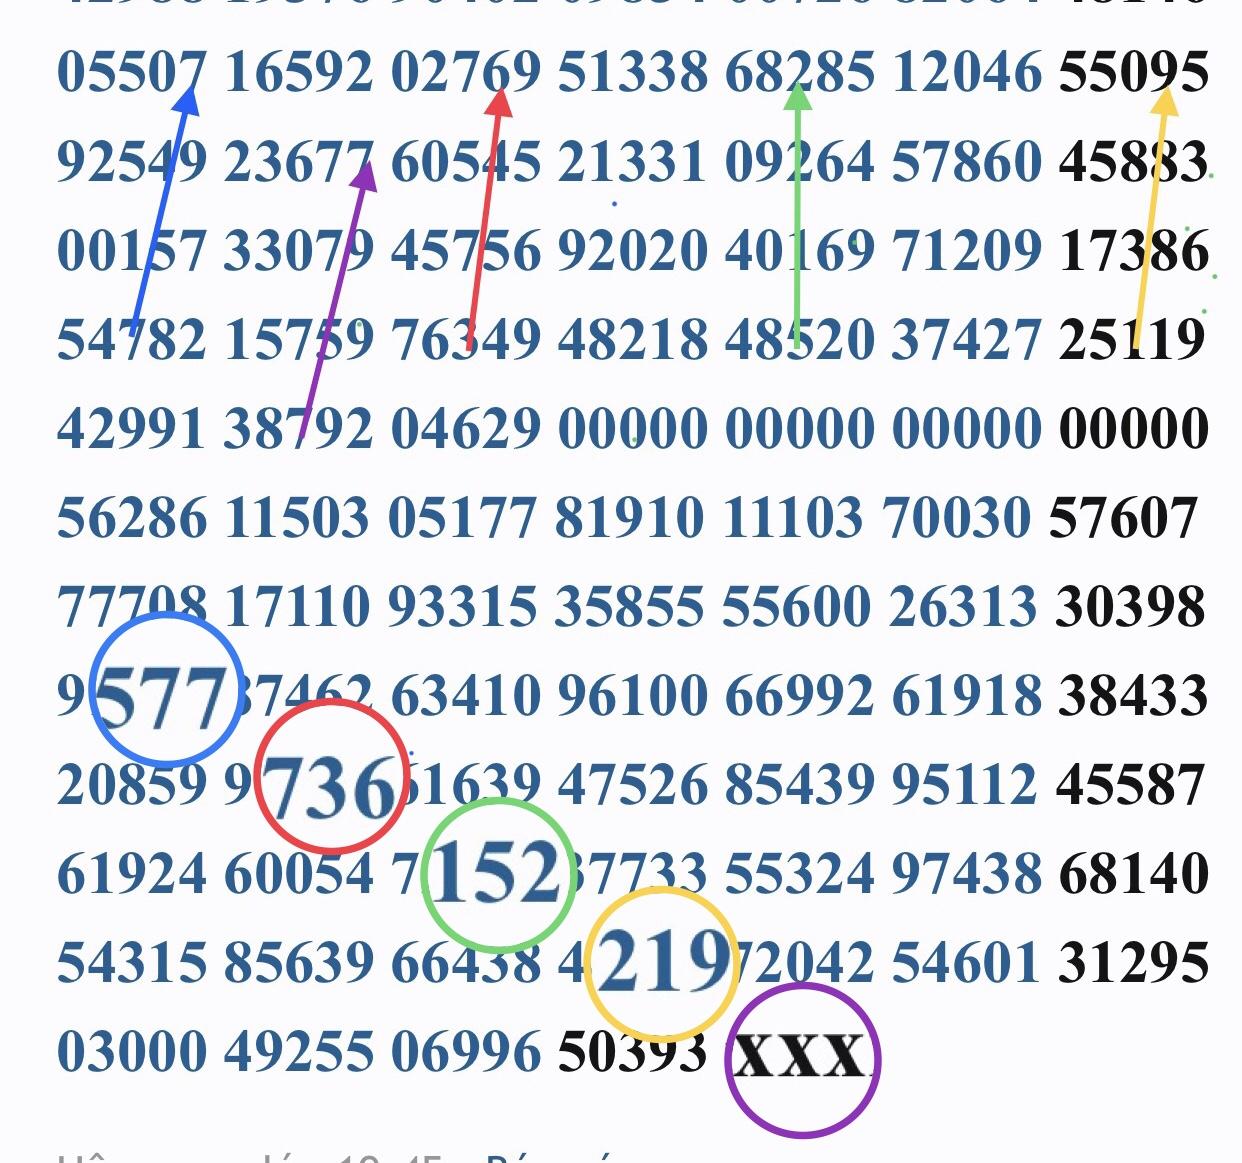 933FE009-E038-4974-9C95-AD9B7BF385F5.jpeg